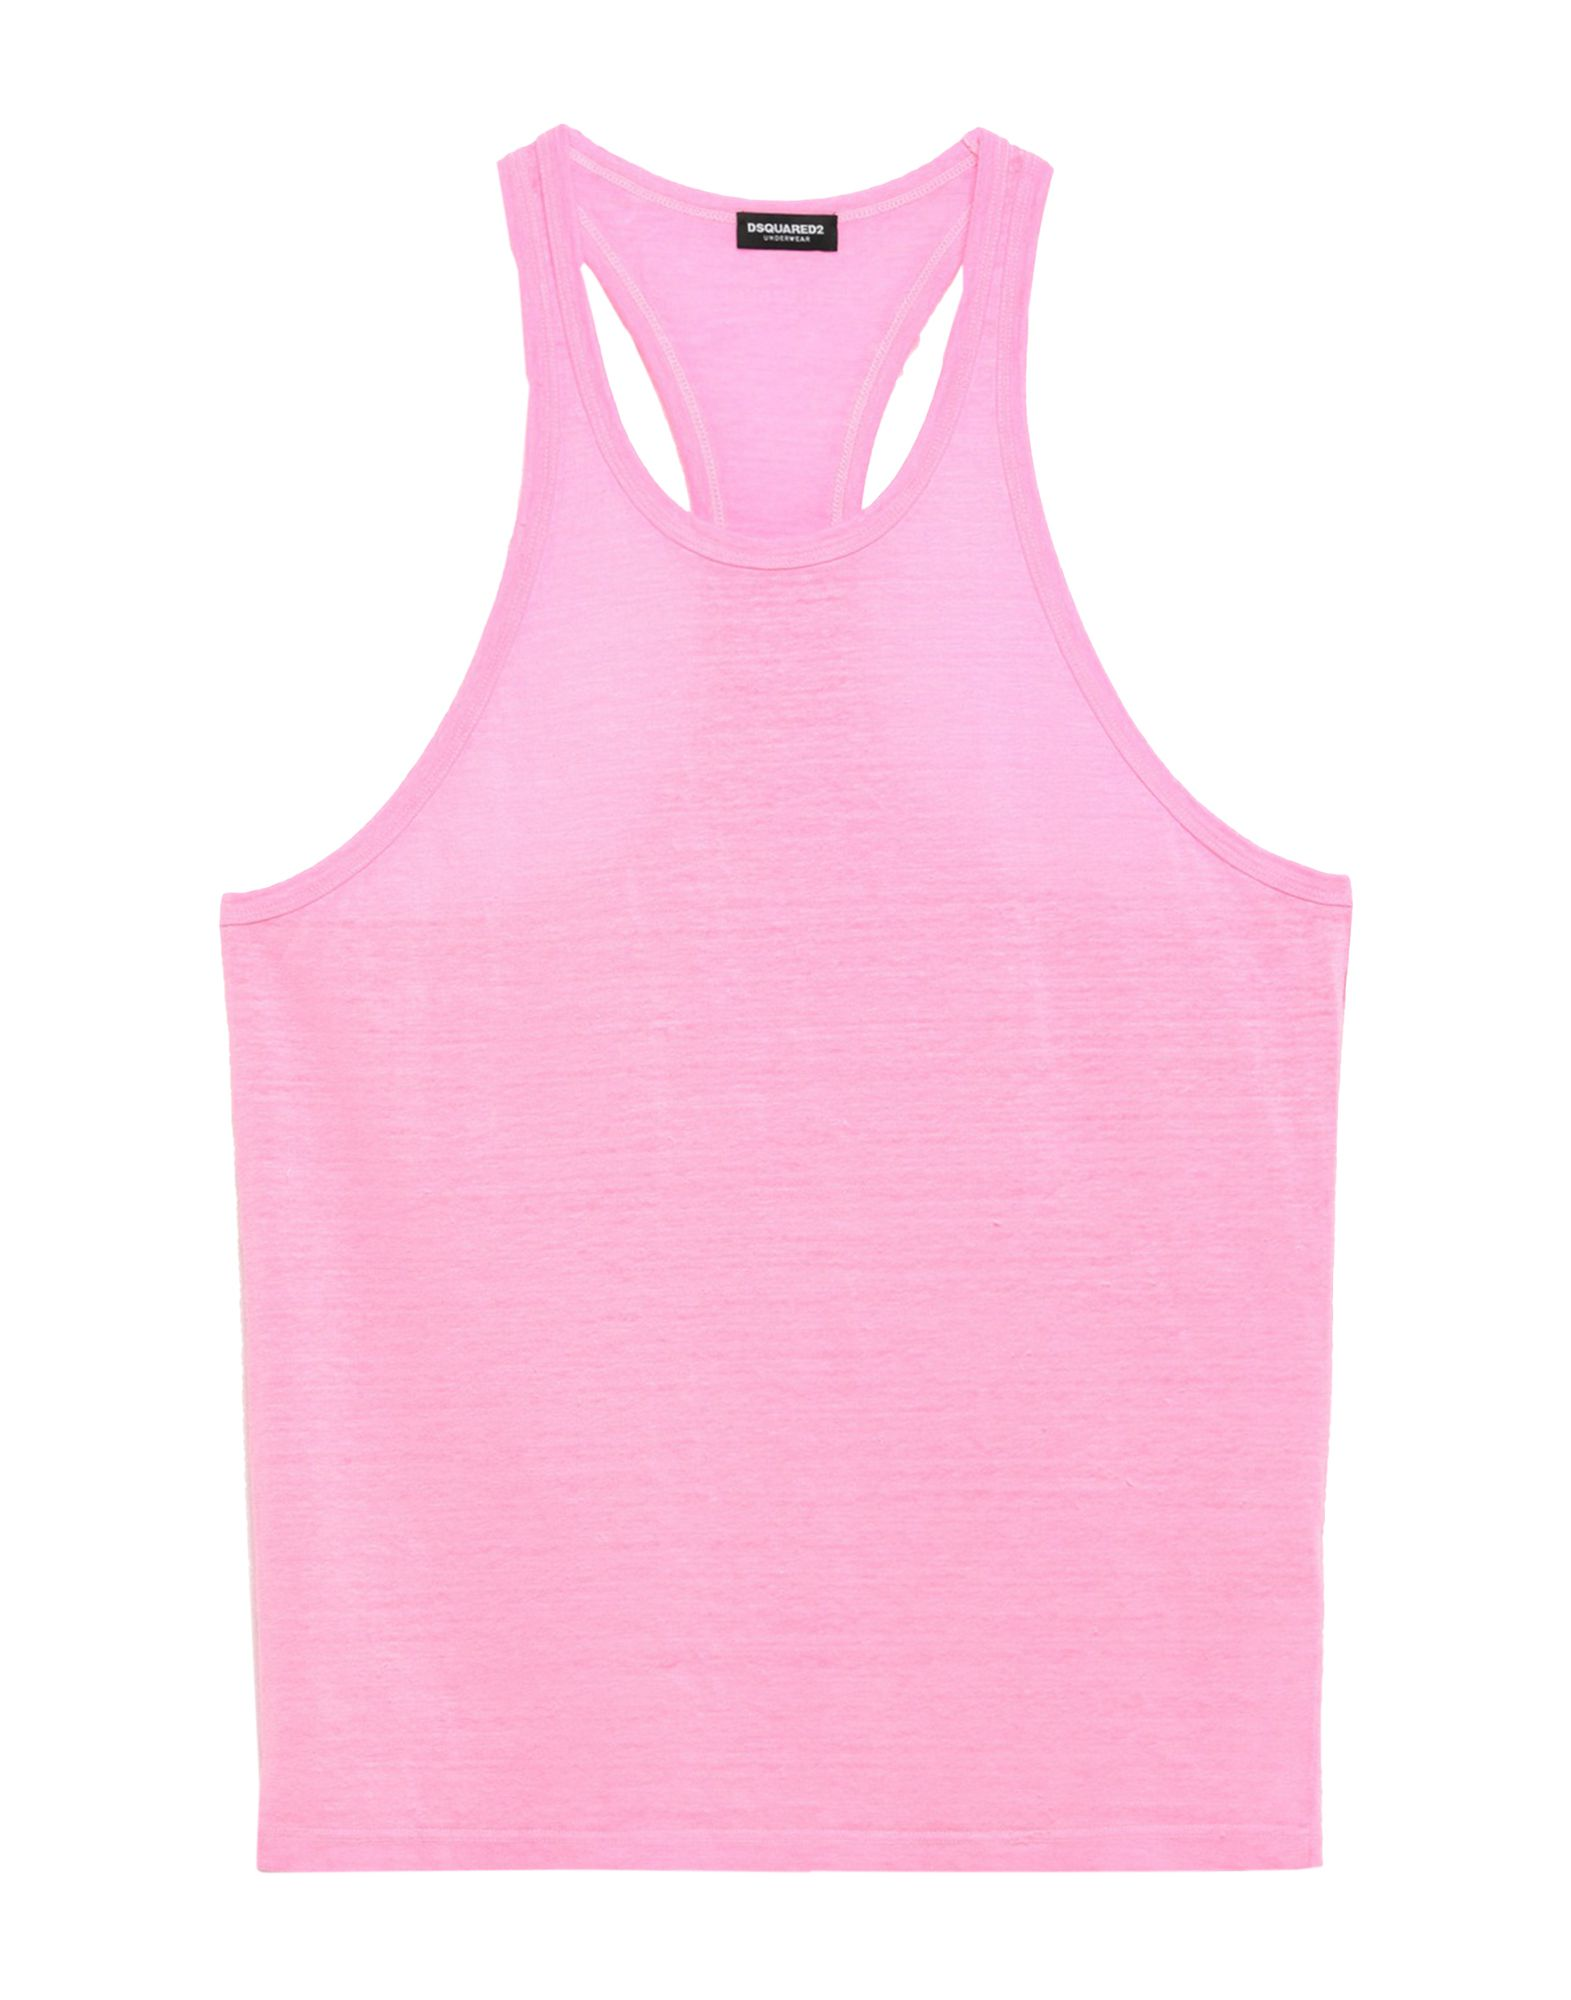 DSQUARED2 Sleeveless undershirts. jersey, print, logo, round collar, basic solid color, sleeveless, no pockets, stretch. 96% Linen, 4% Elastane